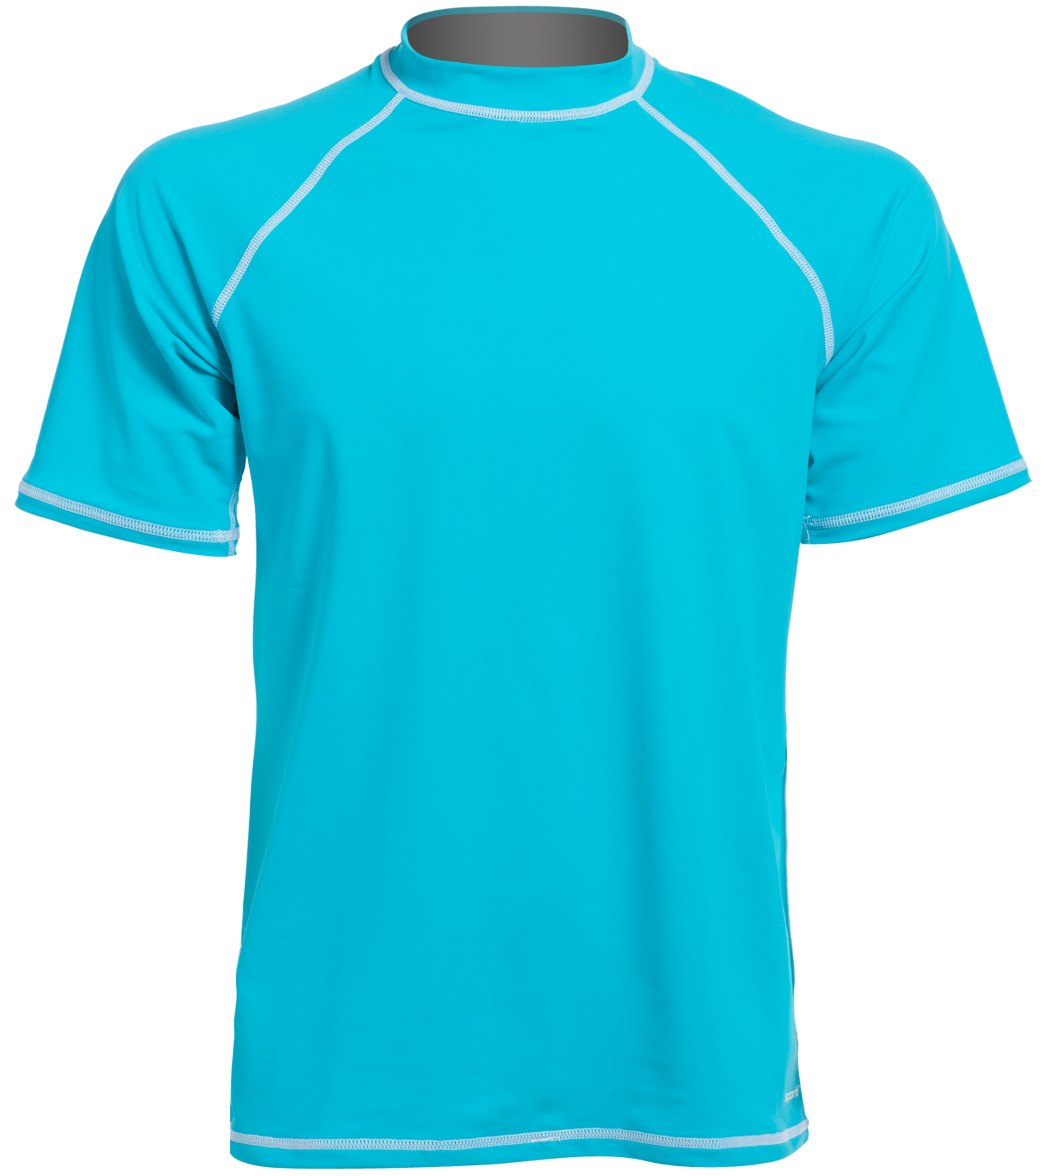 Swim Shirts Uimapuvut Ja Alusvaatteet